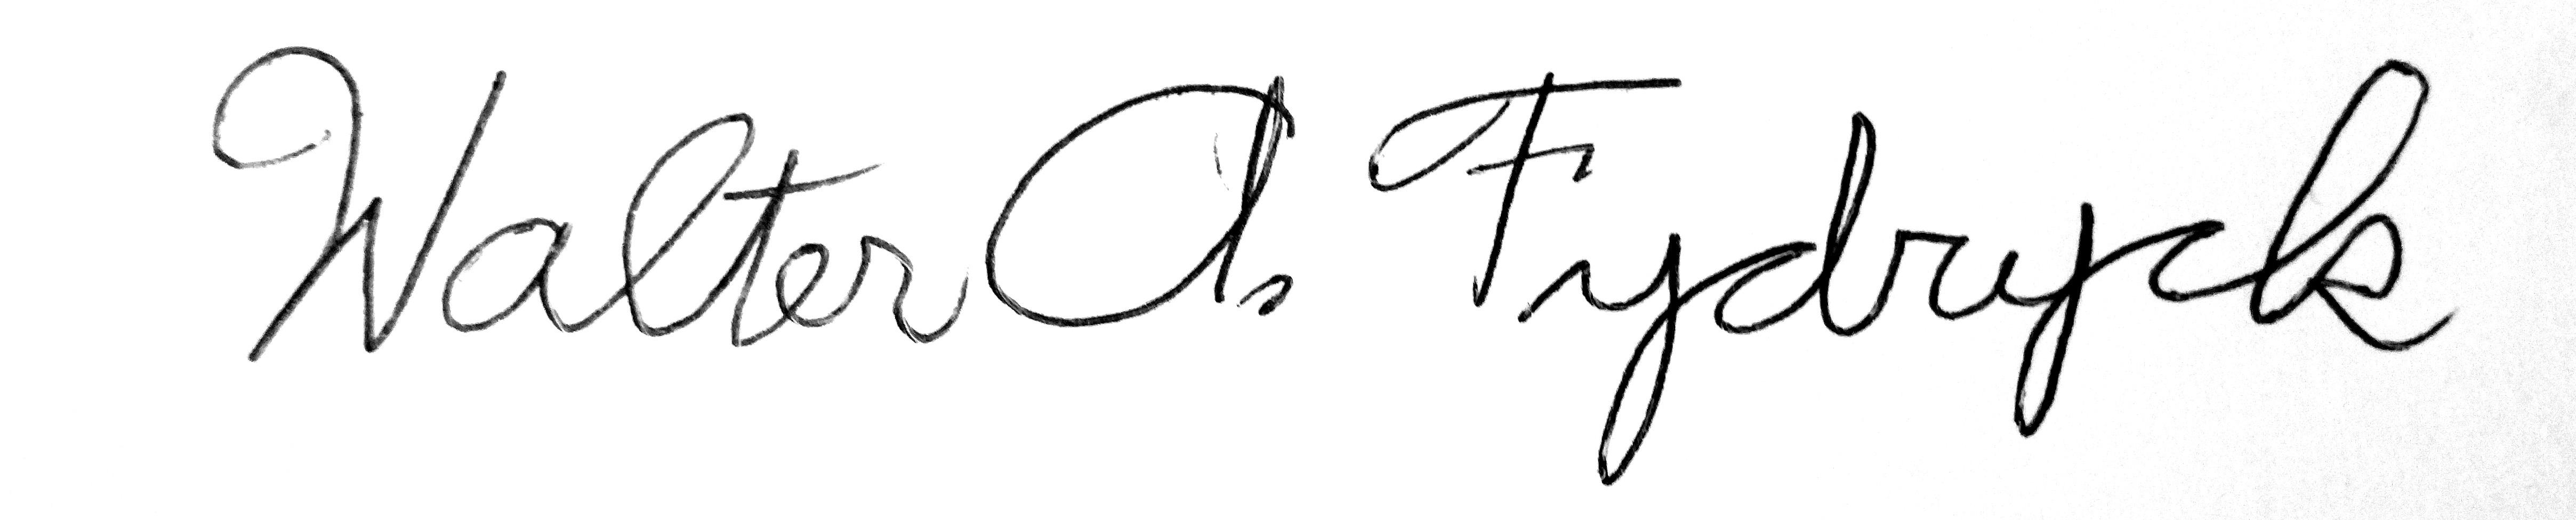 Walter Fydryck Signature